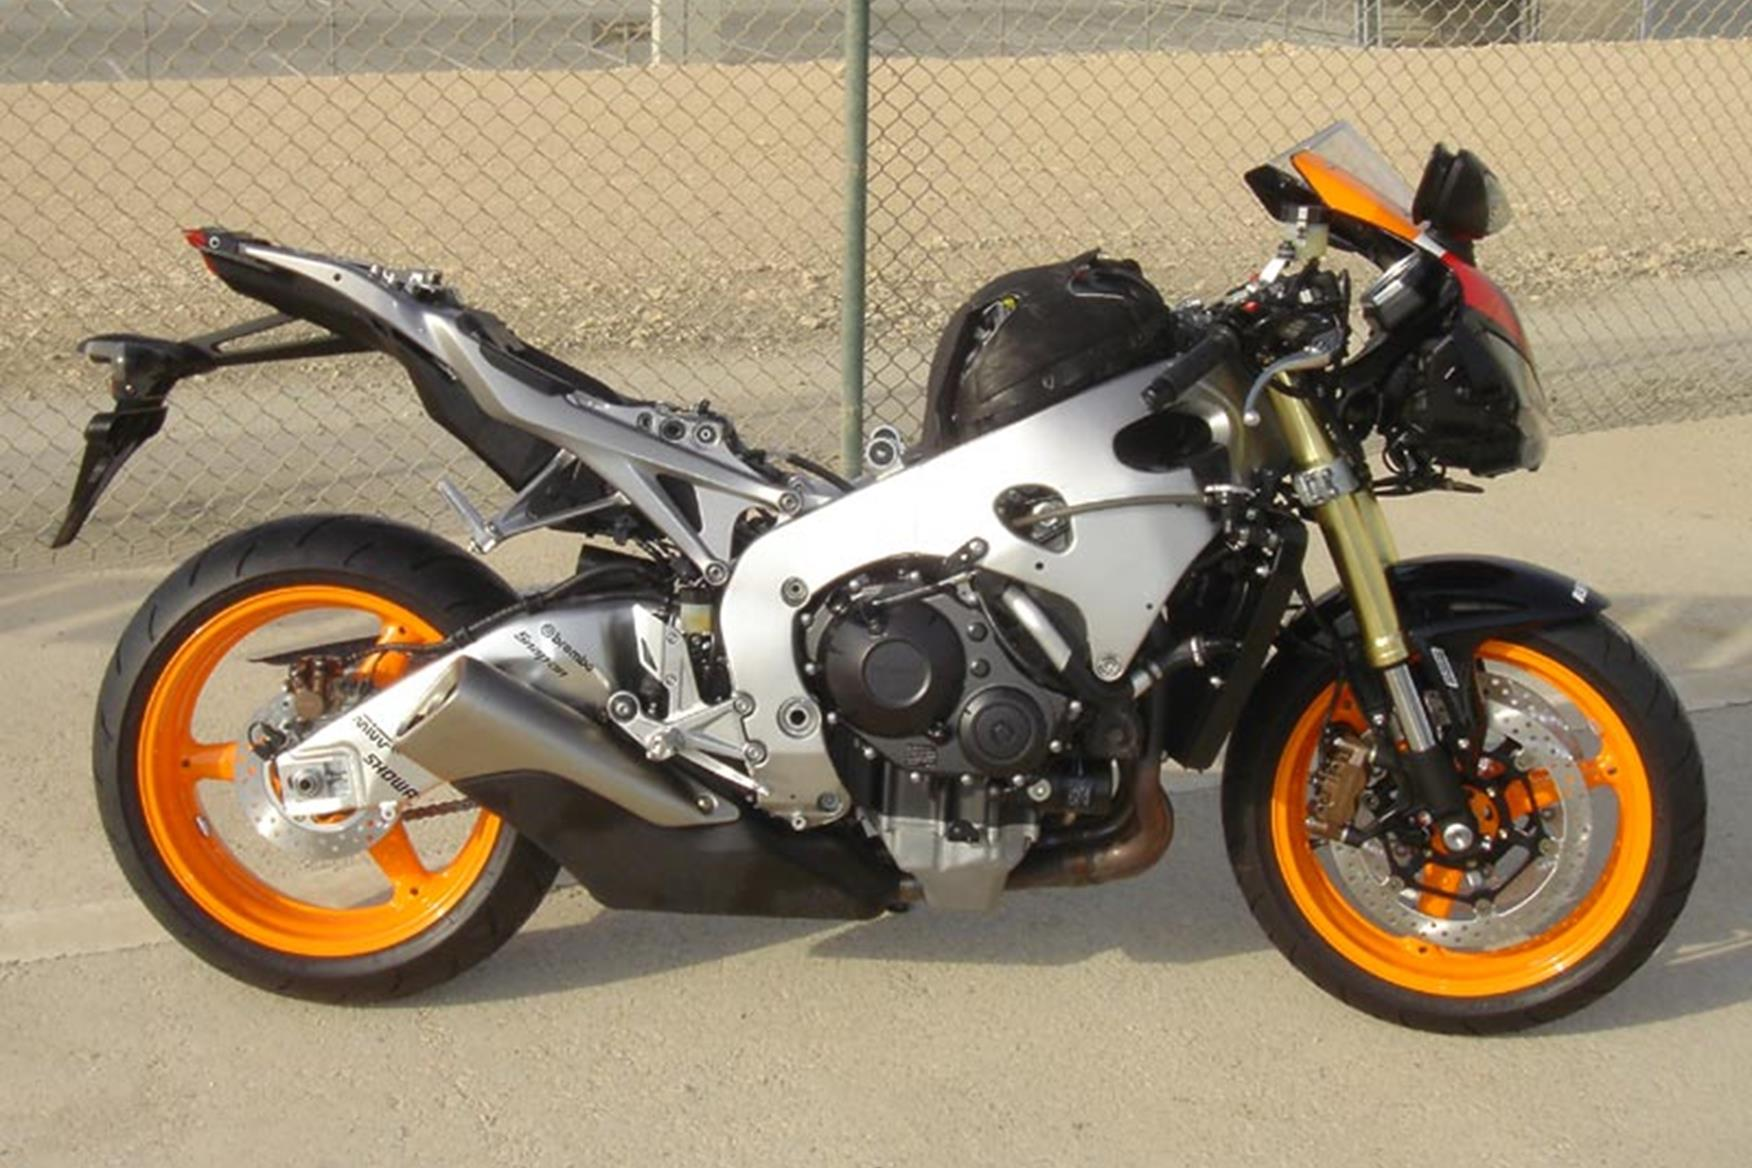 Honda CBR 1000 RRC Fireblade 2012 Replacement Motorcycle Front Brake Lever